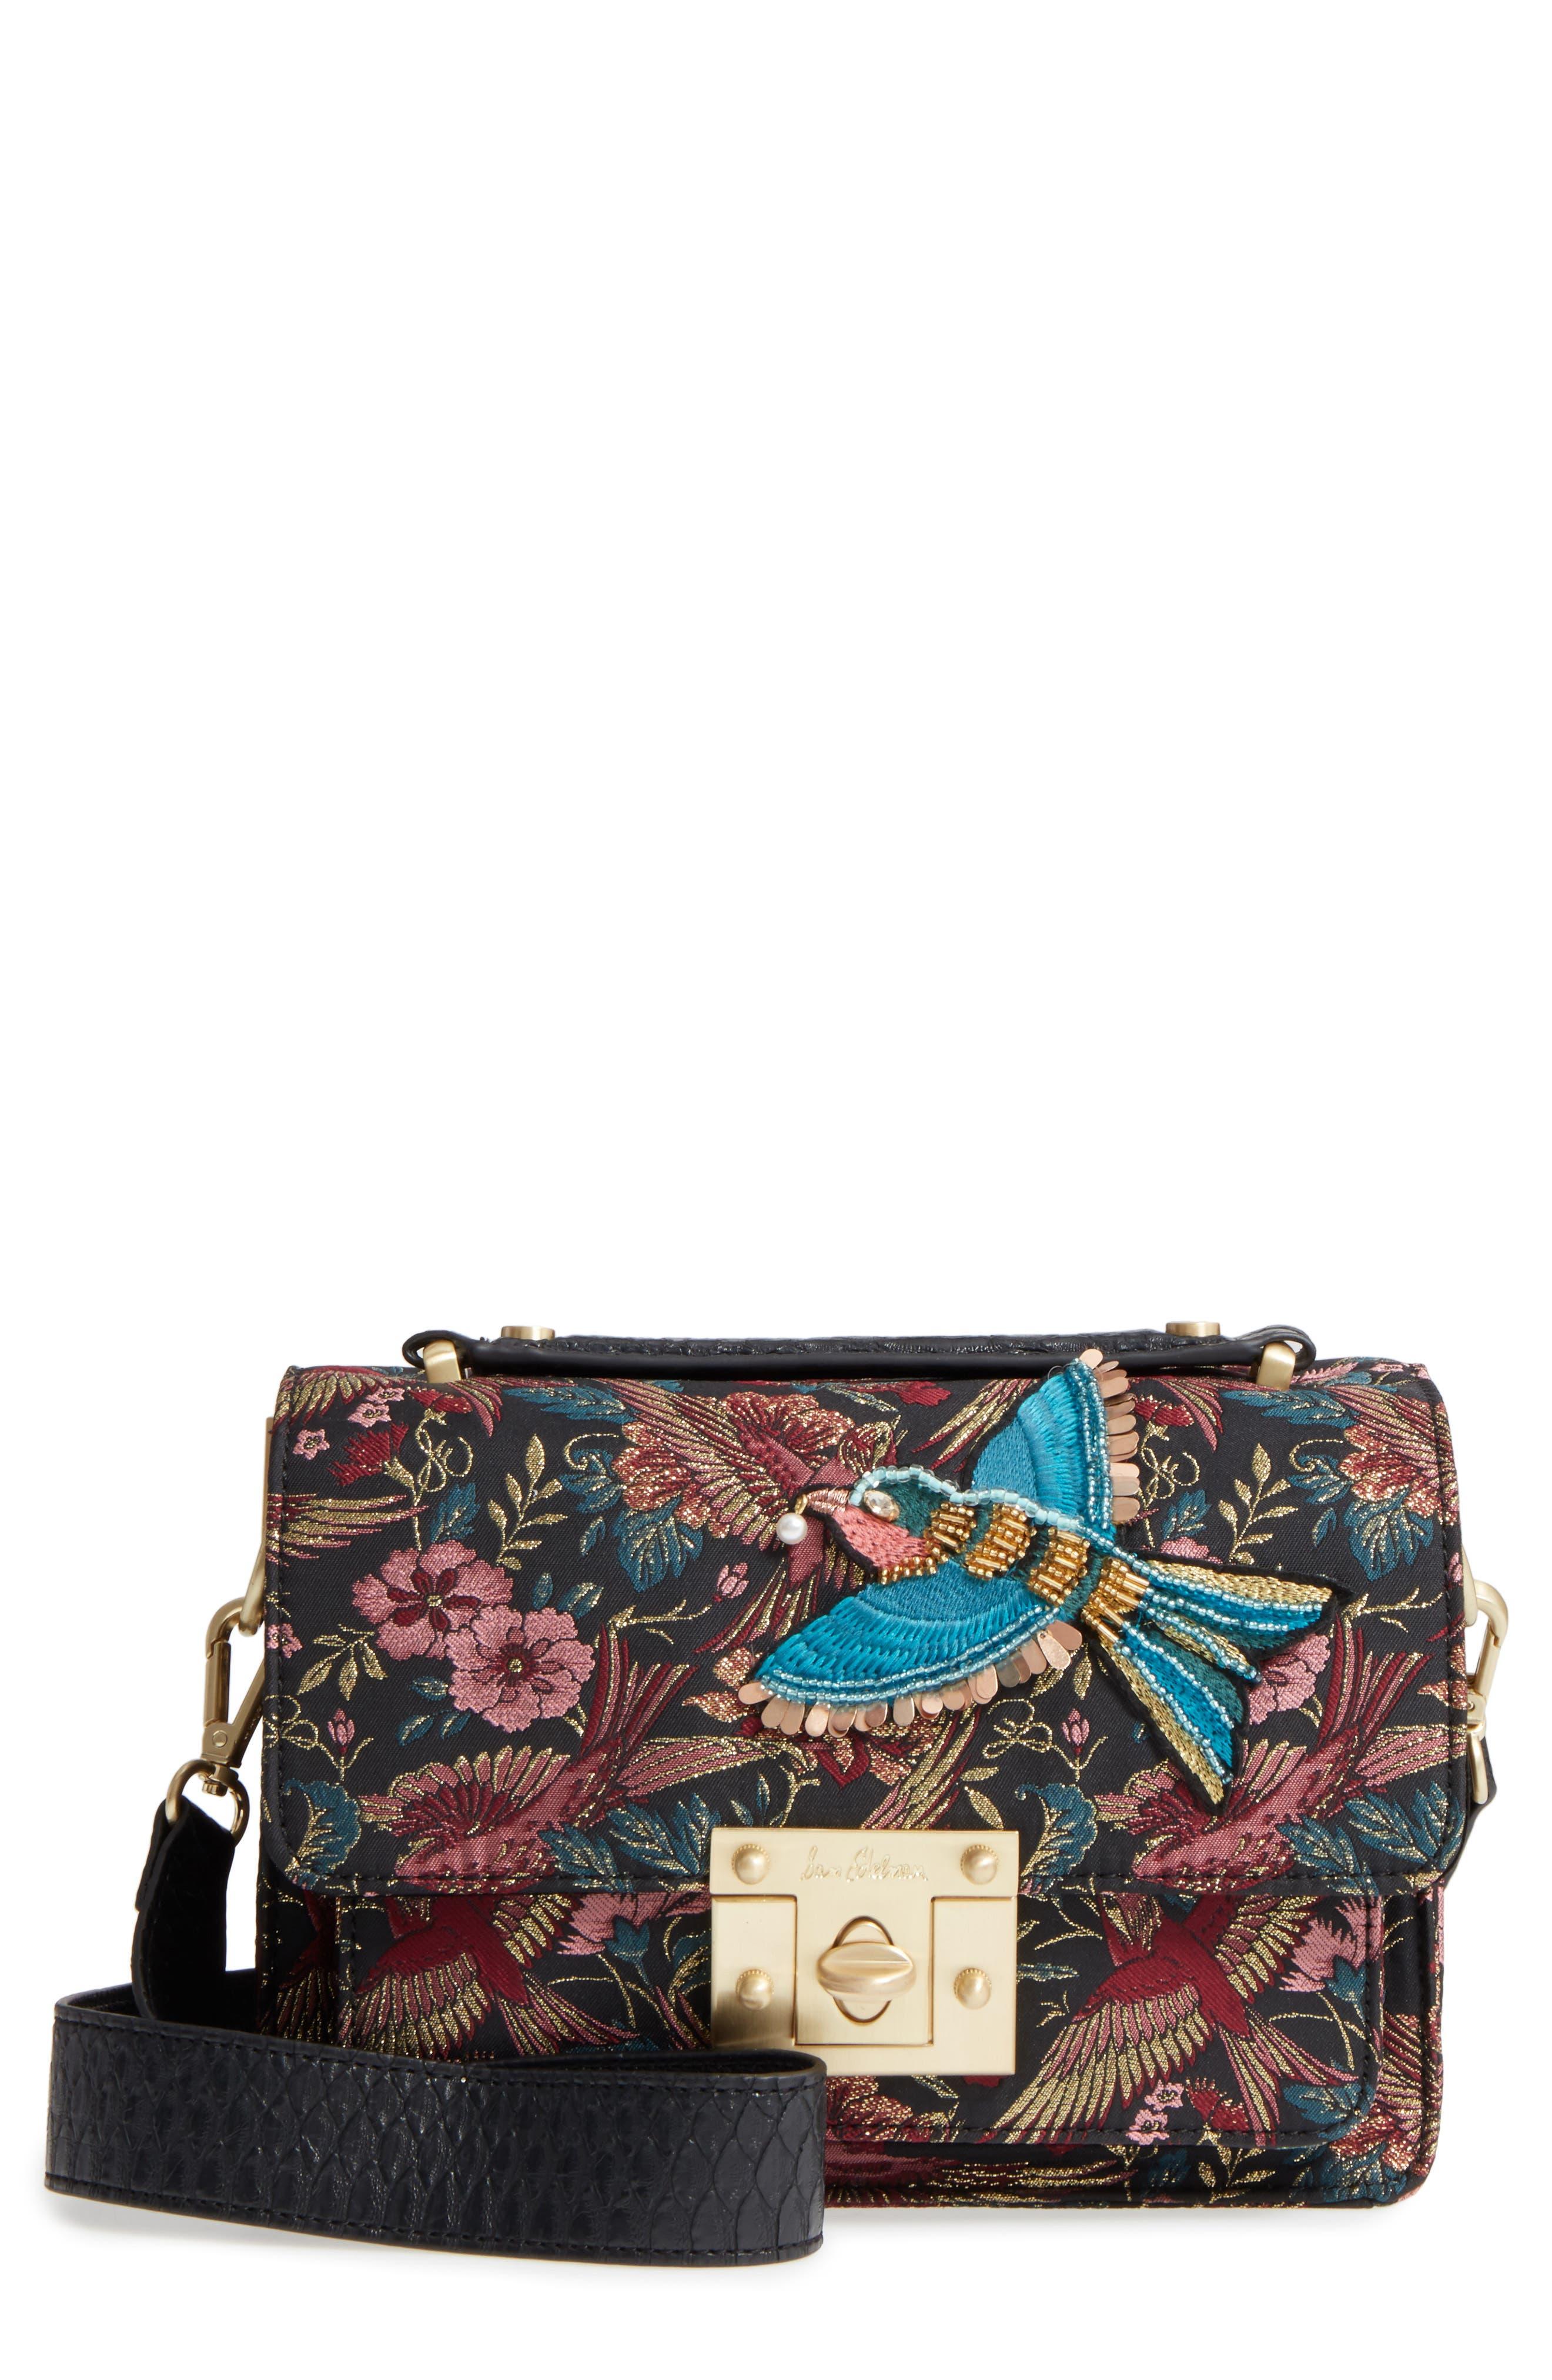 Main Image - Sam Edelman Gessica Jacquard Shoulder Bag